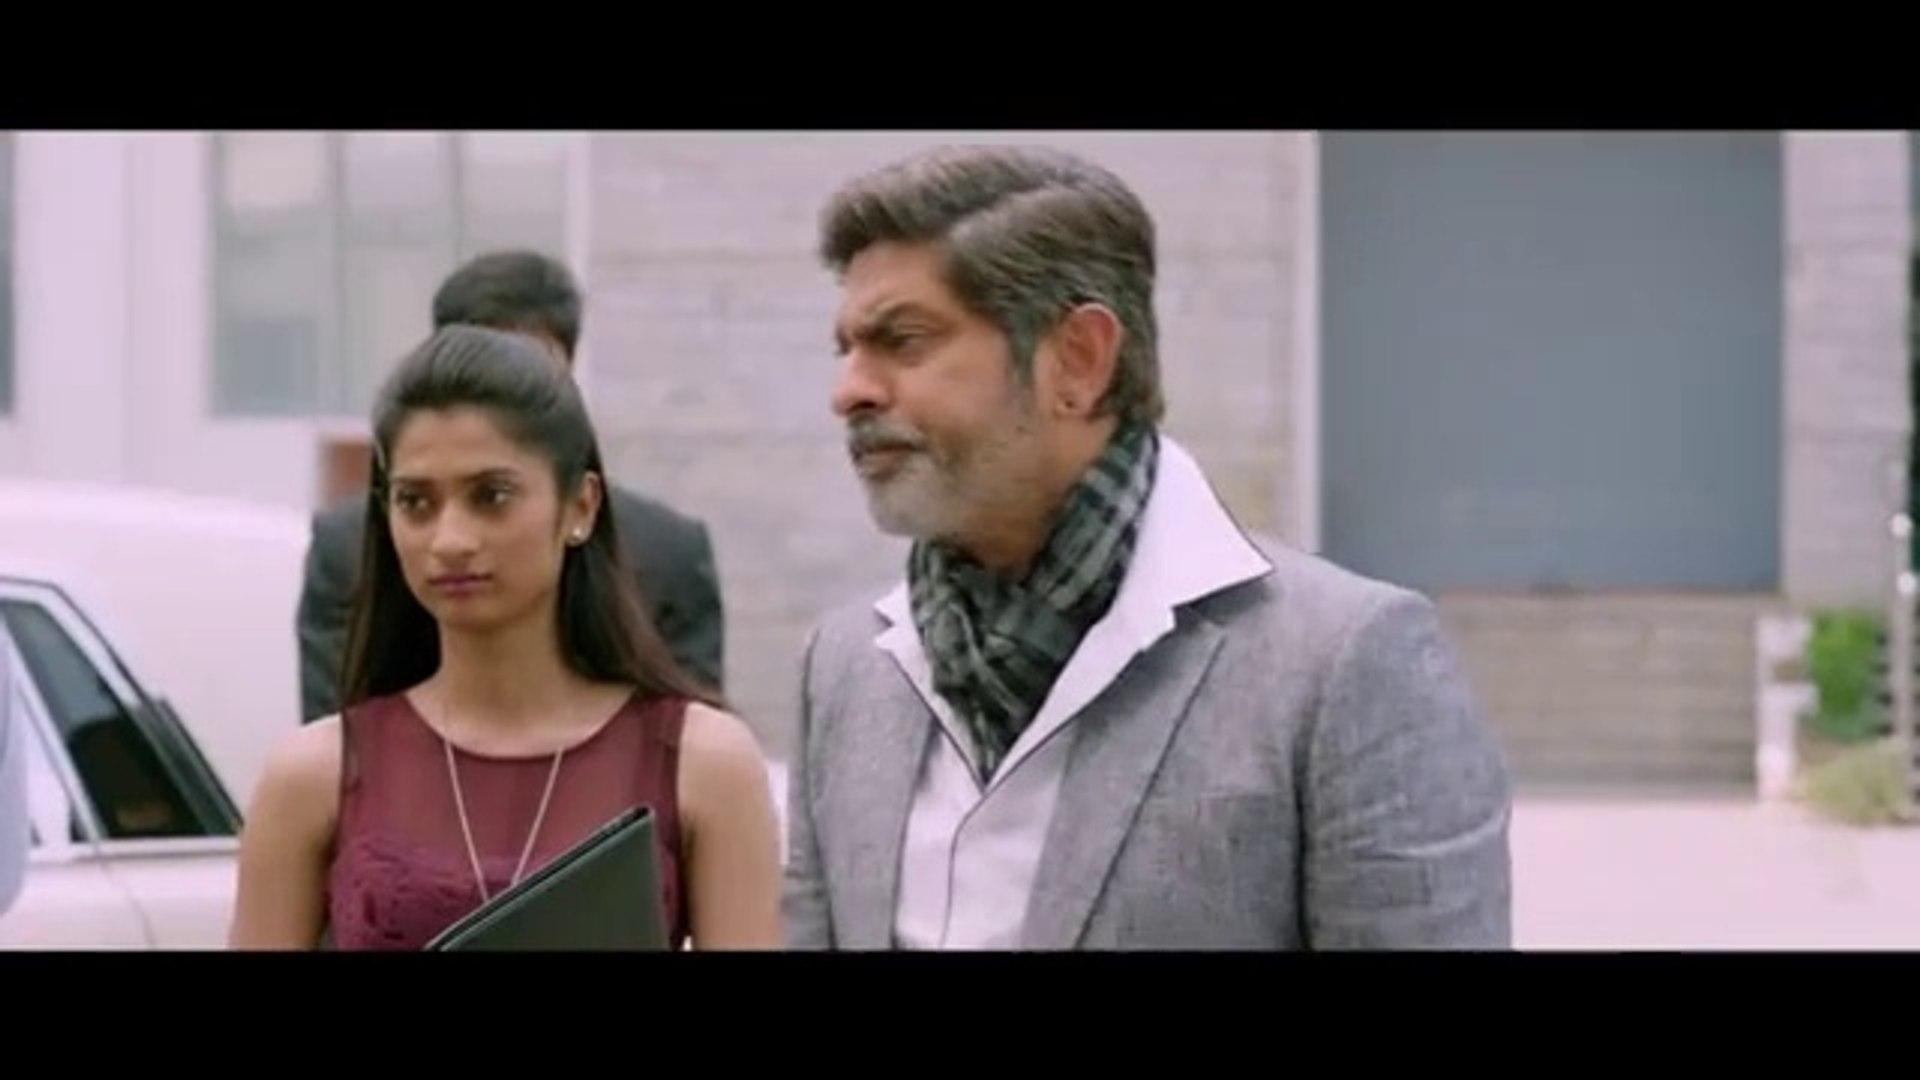 new movies,new movies bollywood,new movies 2019 ,new movies trailer,new movie 2018,new movie hindi,n